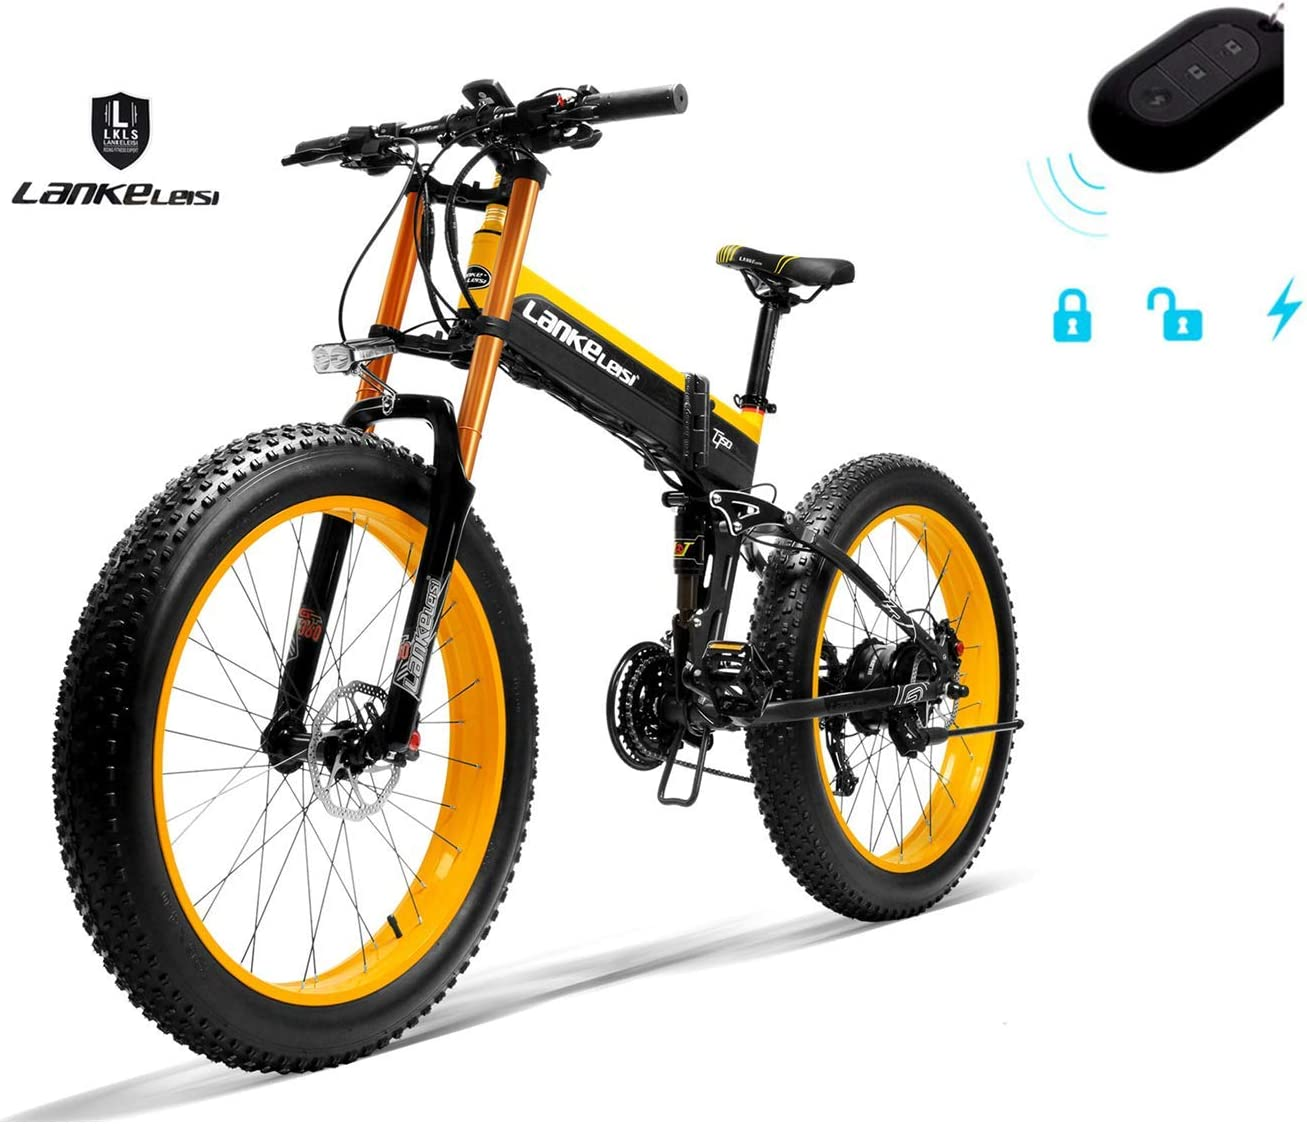 LANKELEISI 750PLUS 48 V 14.5AH 1000 W Motor todopoderoso Bicicleta ...